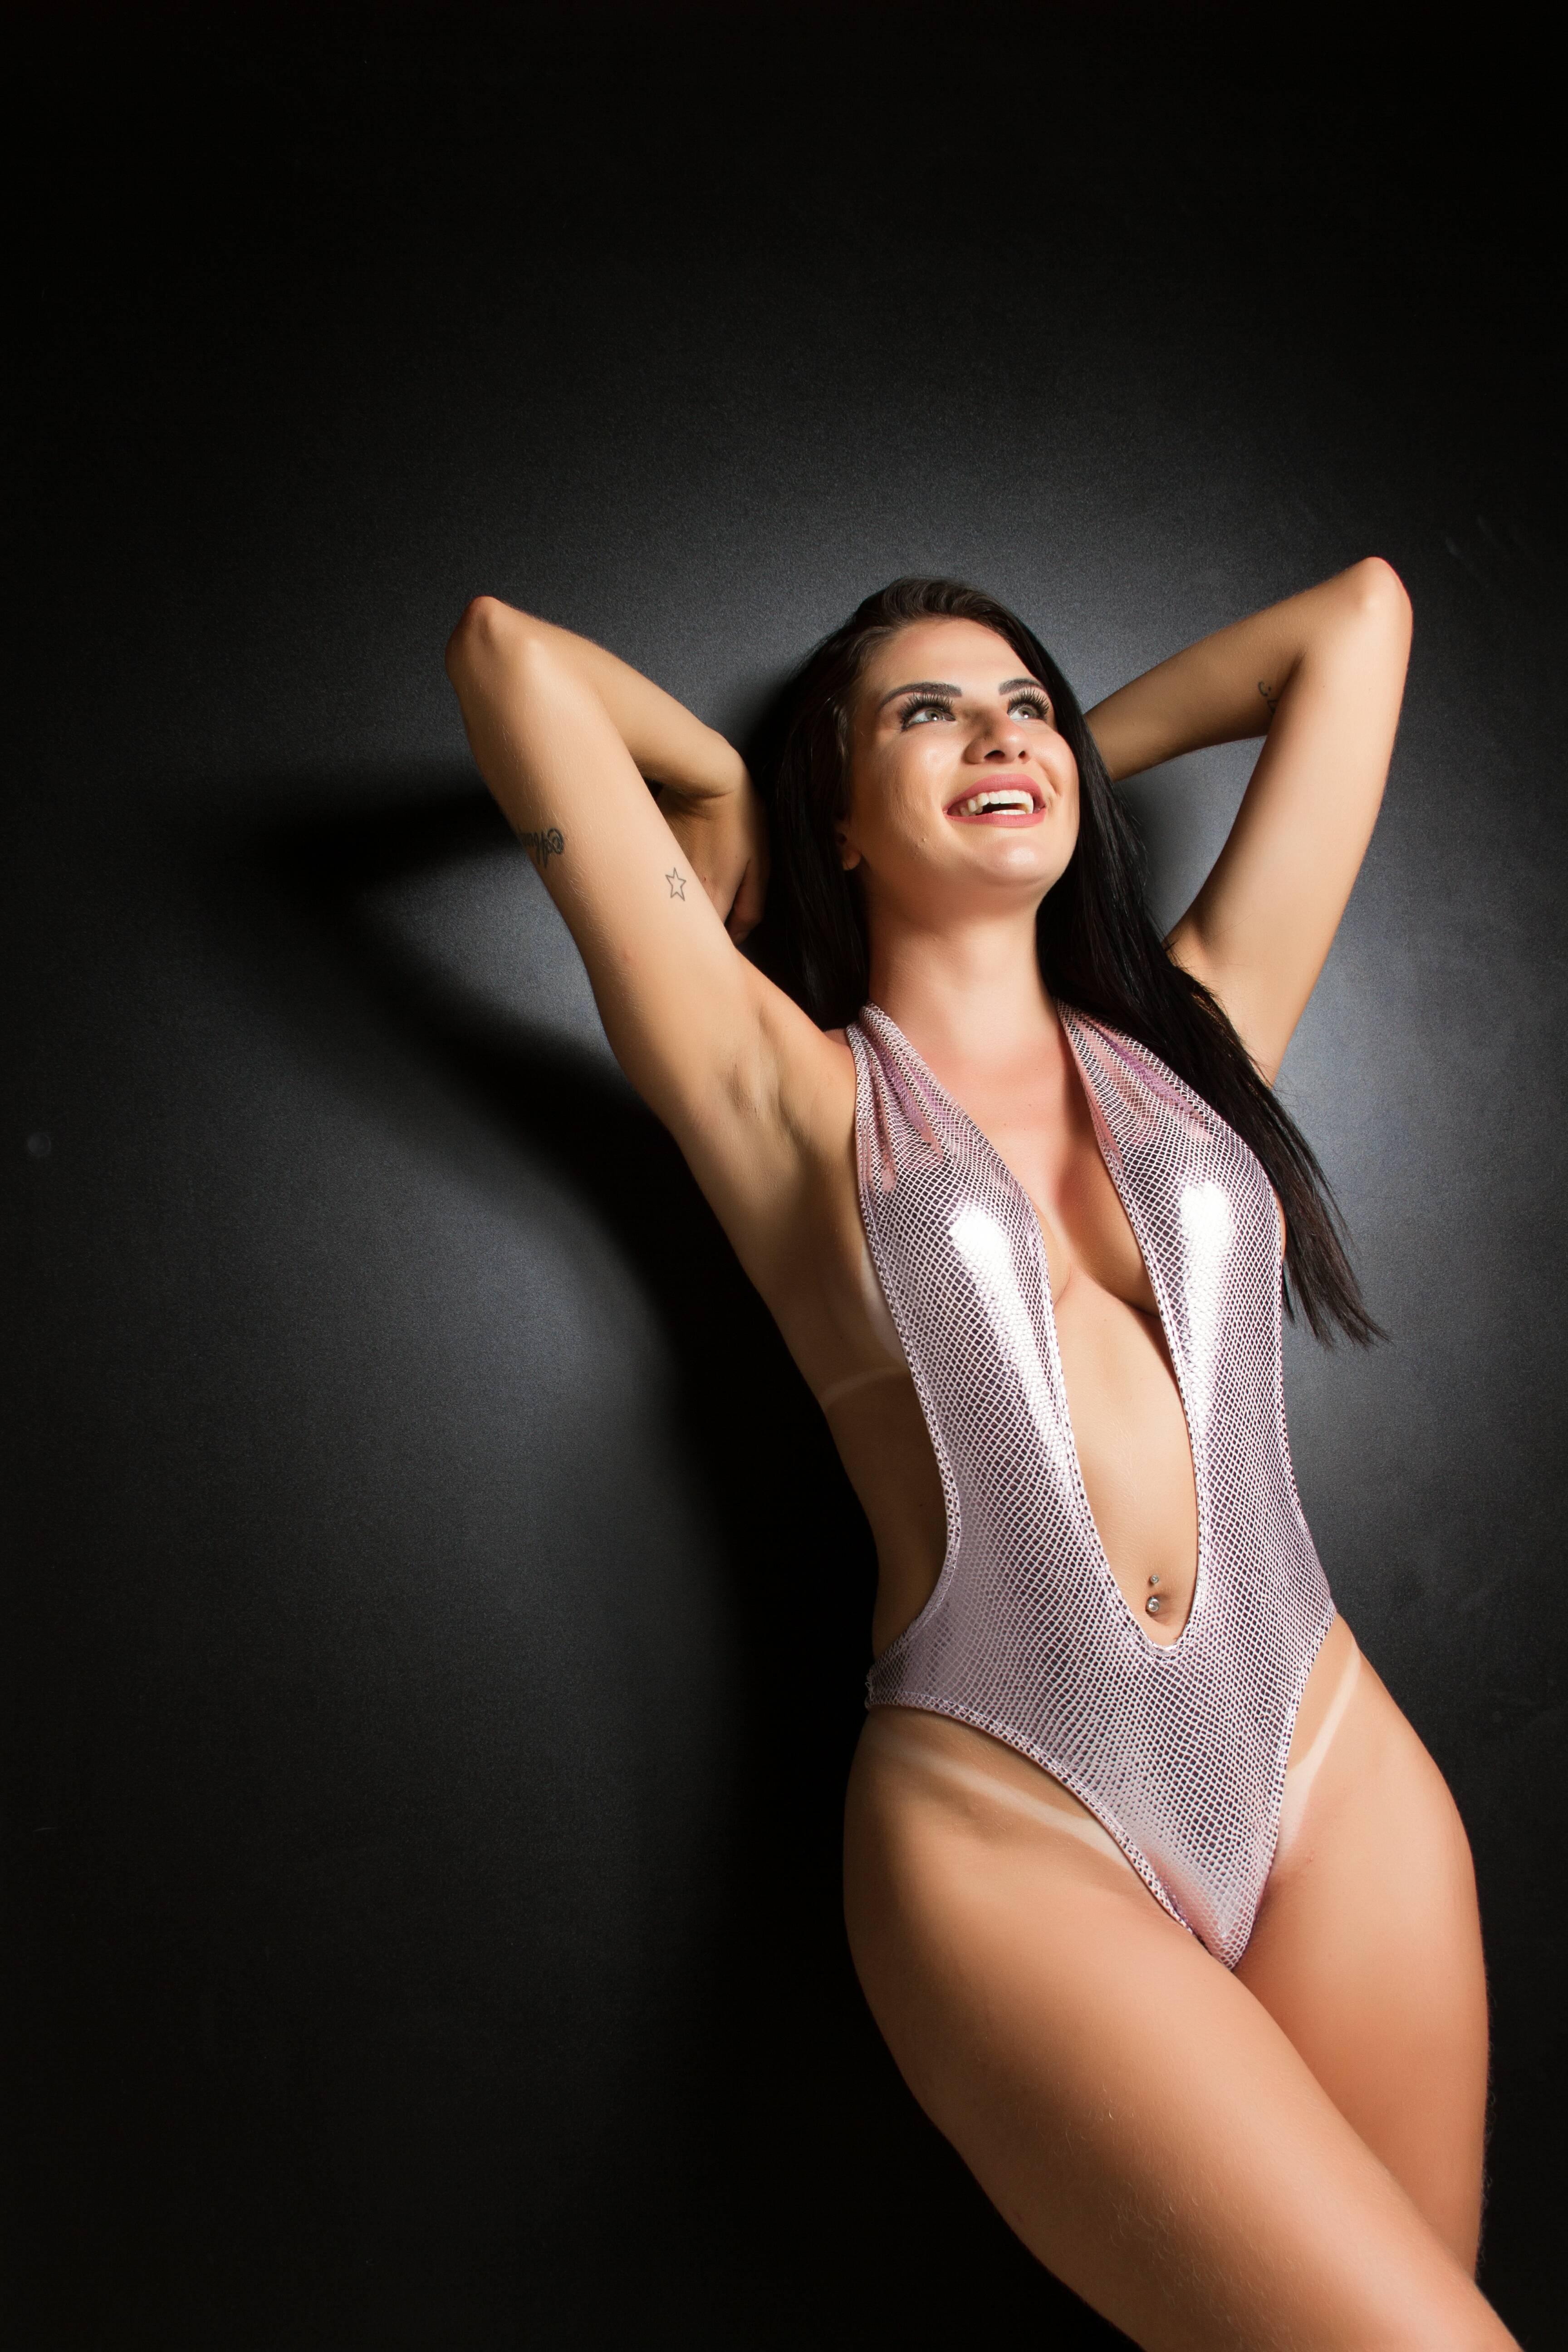 Jack Fernandez posa sensual e planeja ensaio nu. Foto: Studio Woody / M2 Mídia